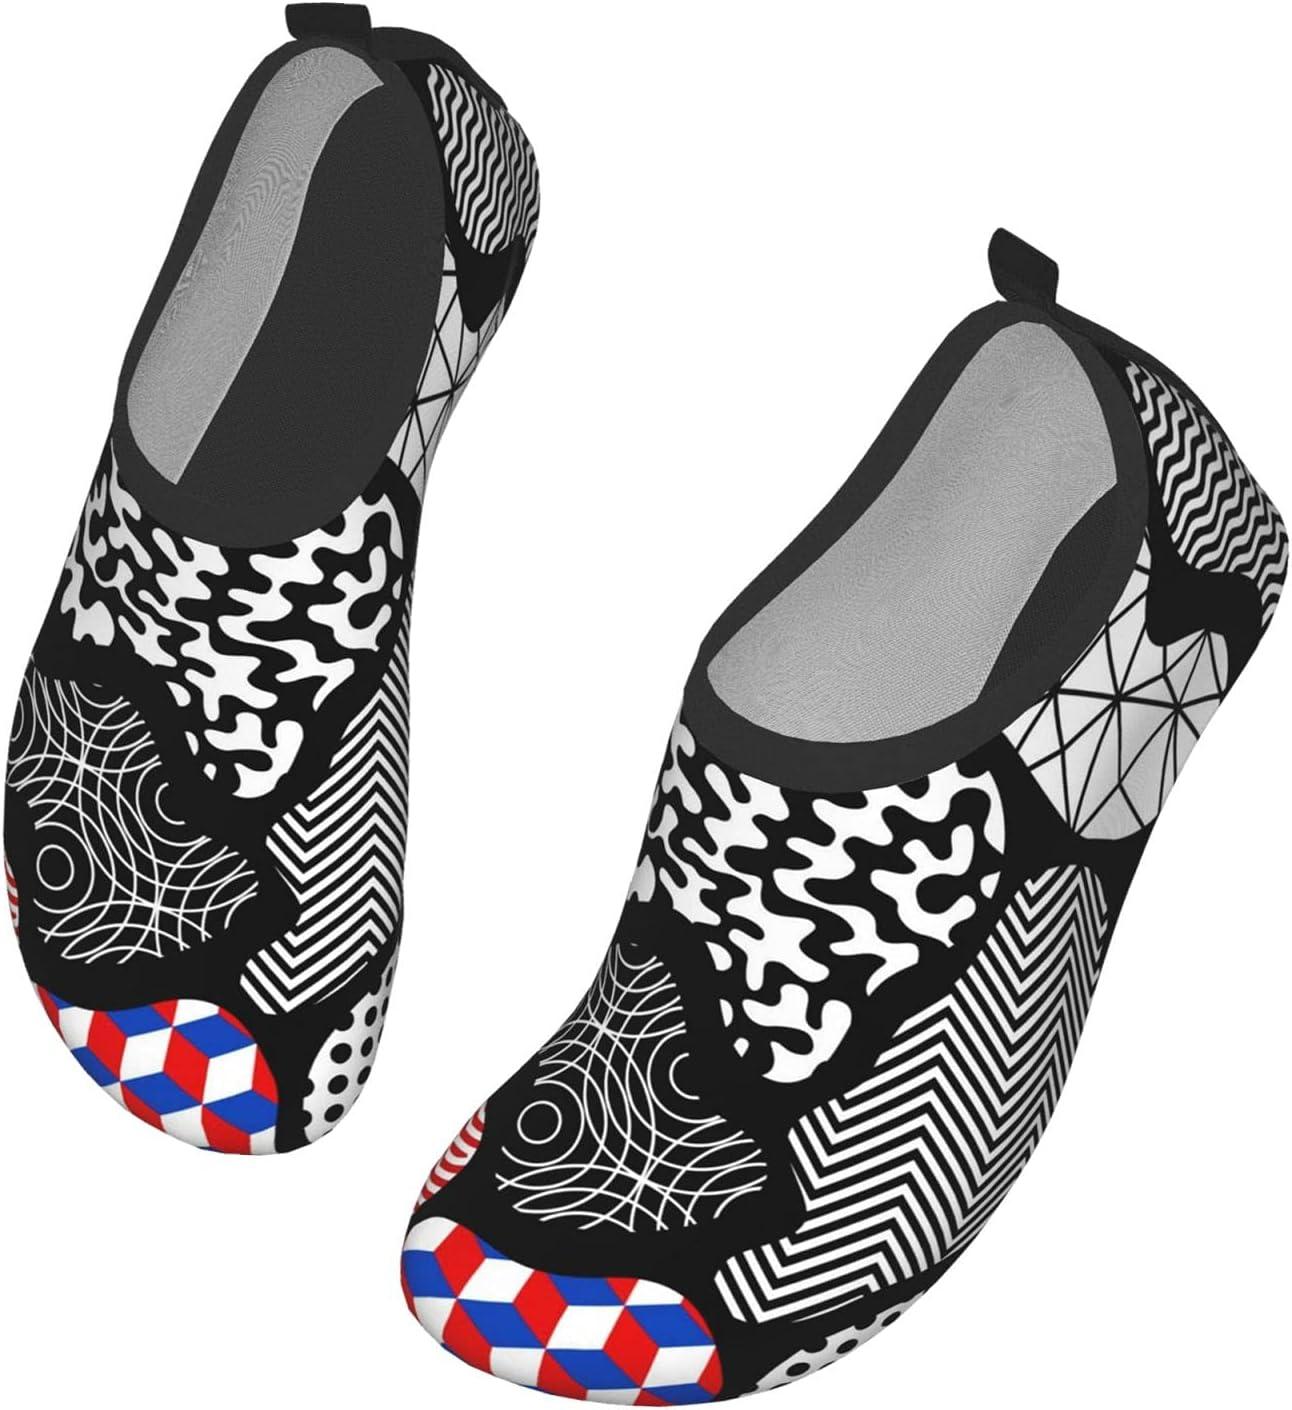 NA Large Color Pattern Men's Women's Water Shoes Barefoot Quick Dry Slip-On Aqua Socks for Yoga Beach Sports Swim Surf